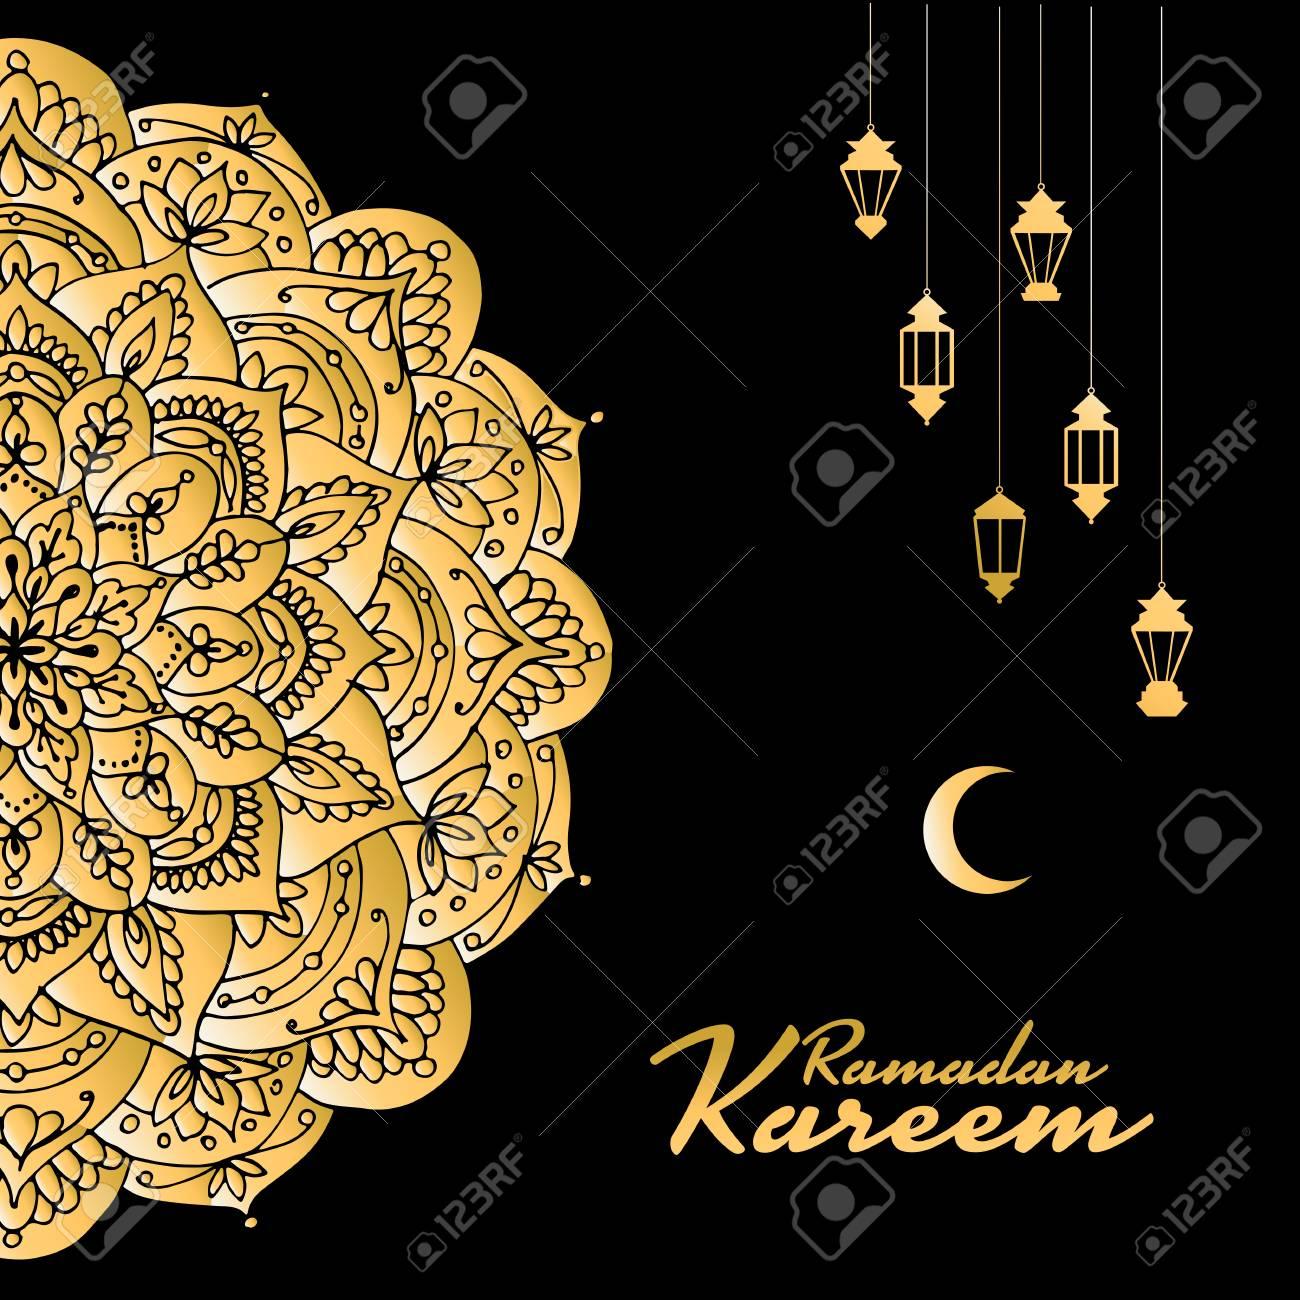 Traditional ramadan kareem month celebration greeting card design stockfoto traditional ramadan kareem month celebration greeting card design vector illustration m4hsunfo